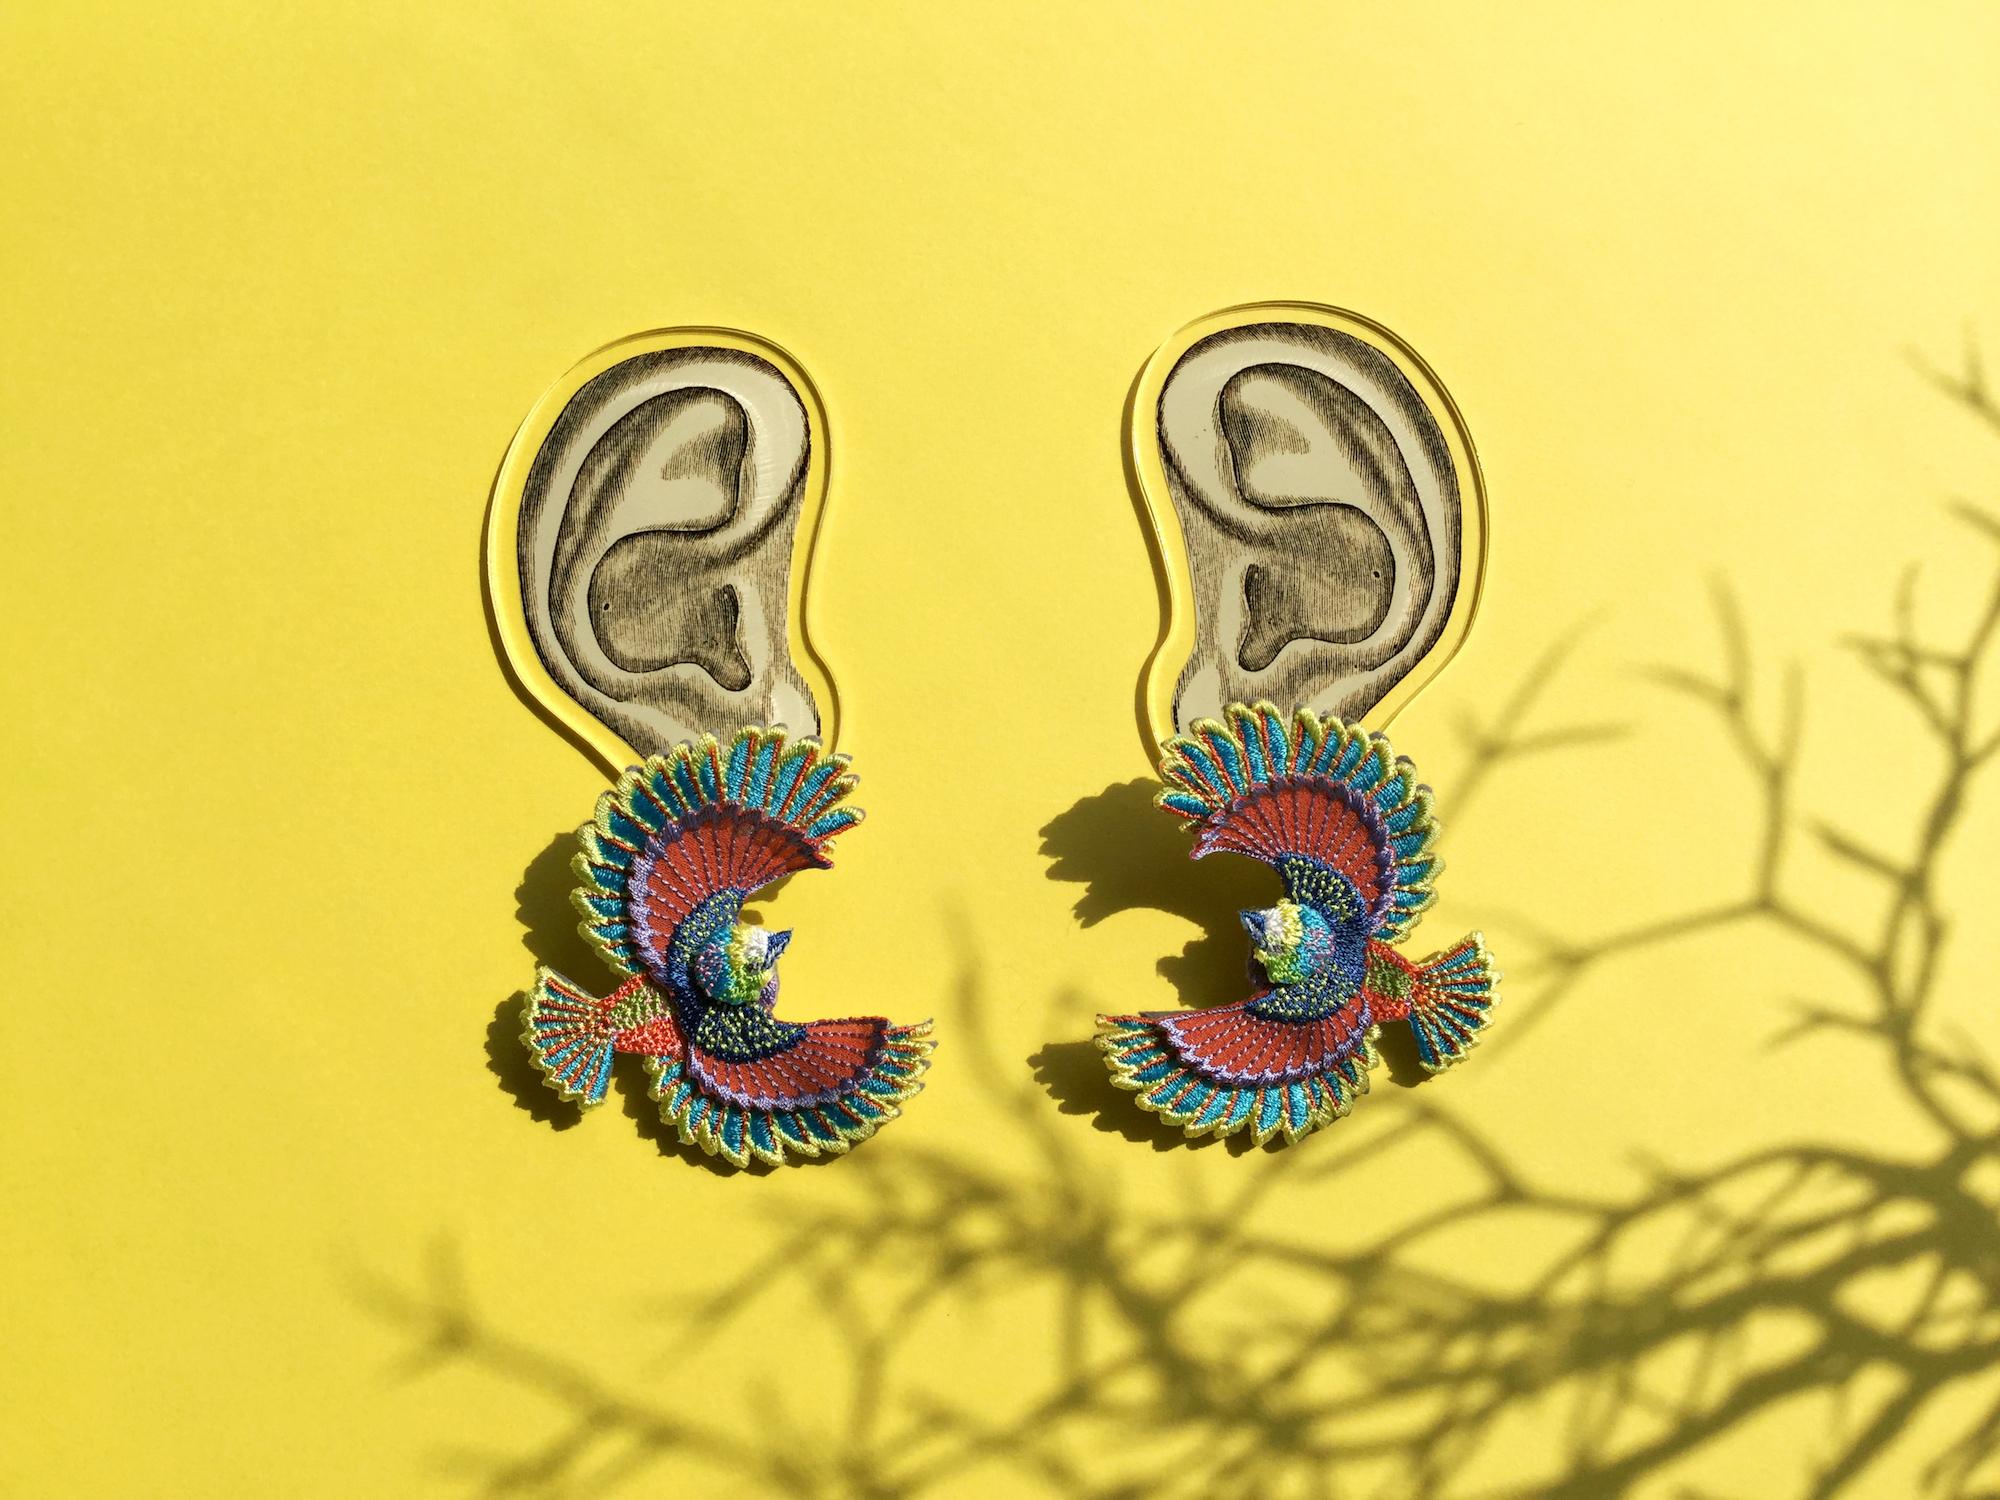 ARRO / 刺繍 ピアス・イヤリング / Flying bird / multi-color